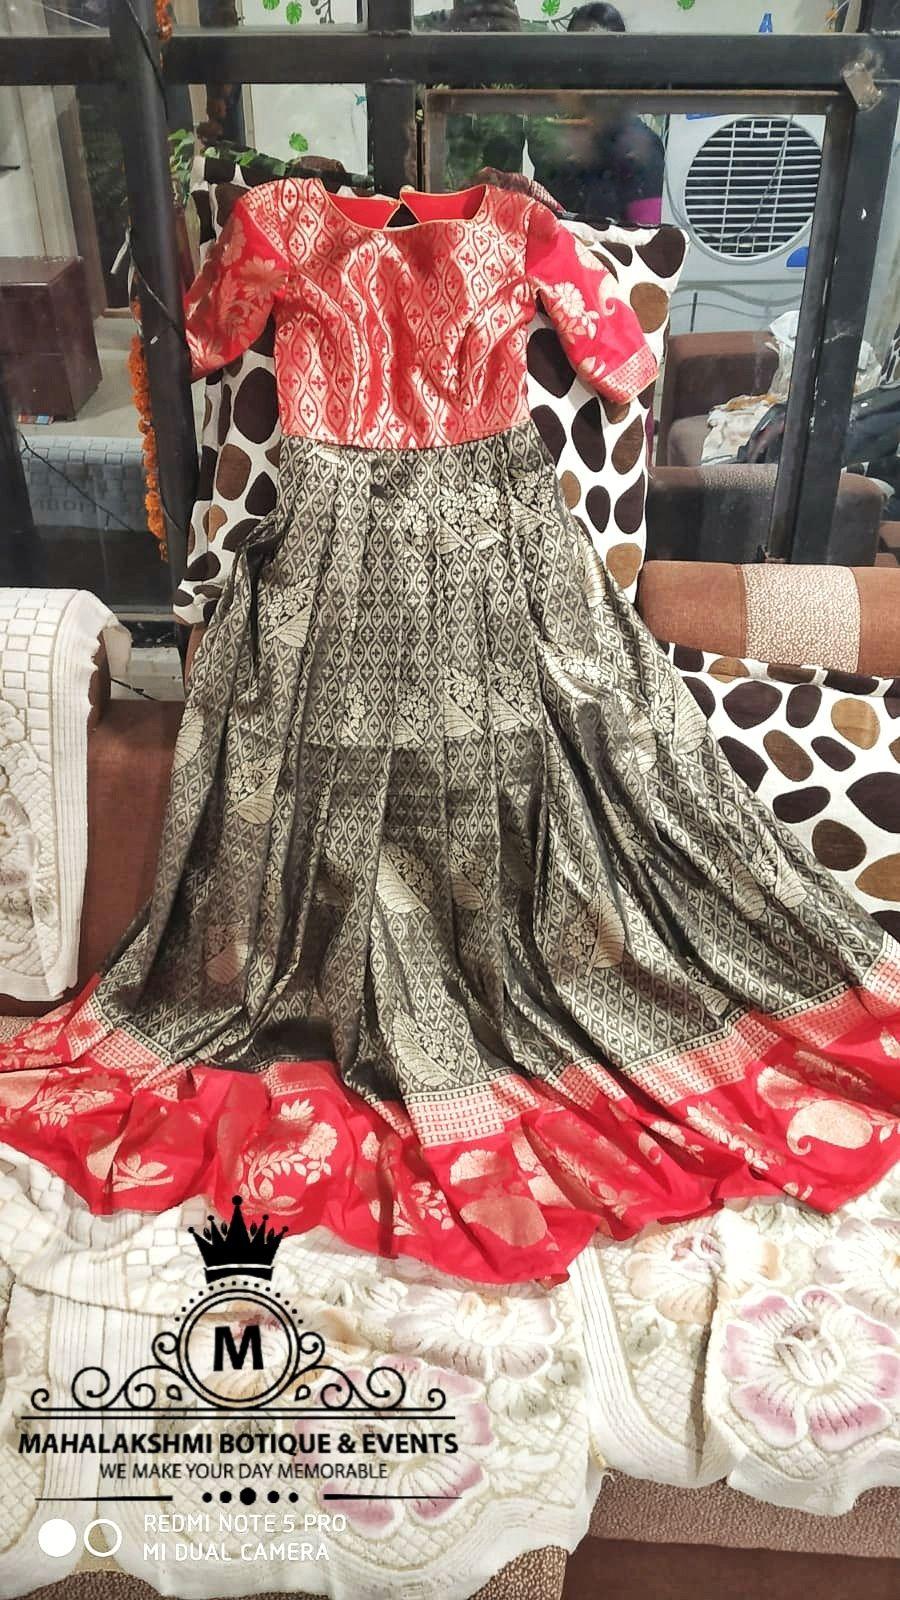 Photo By Sri Mahalakshmi Boutique and Events - Bridal Wear